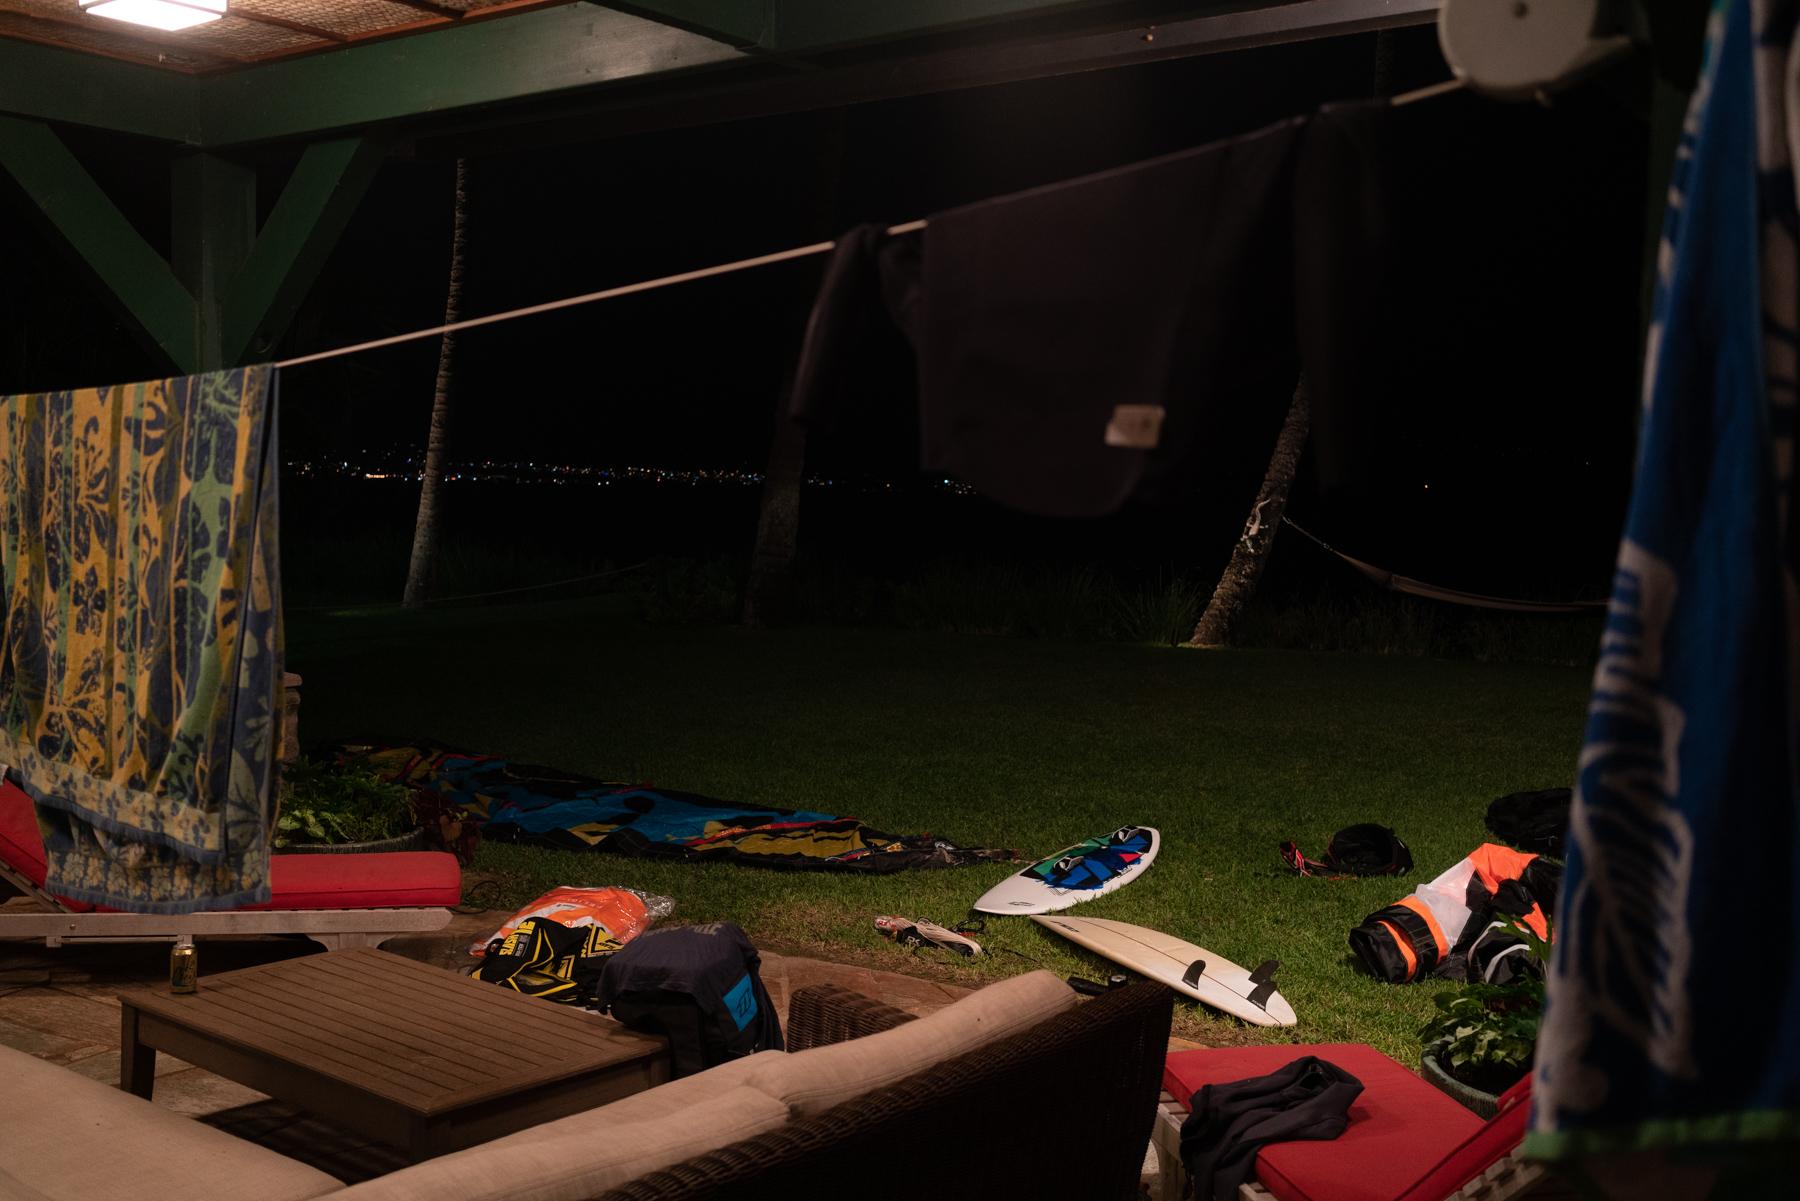 Maui-Trip-Kite-3.jpg